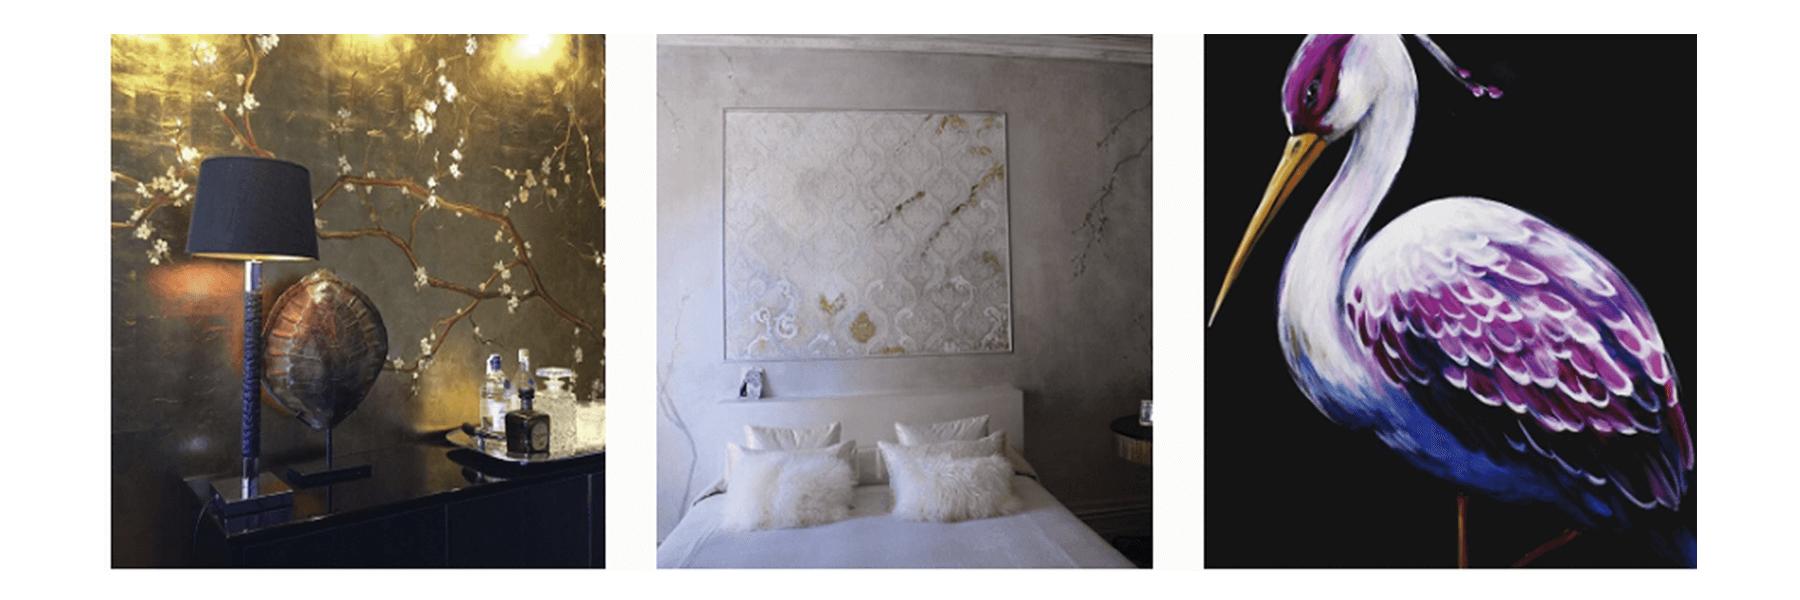 Carol-Moreno-pintora-artistica-wall-mural-art-efectos-decoracion